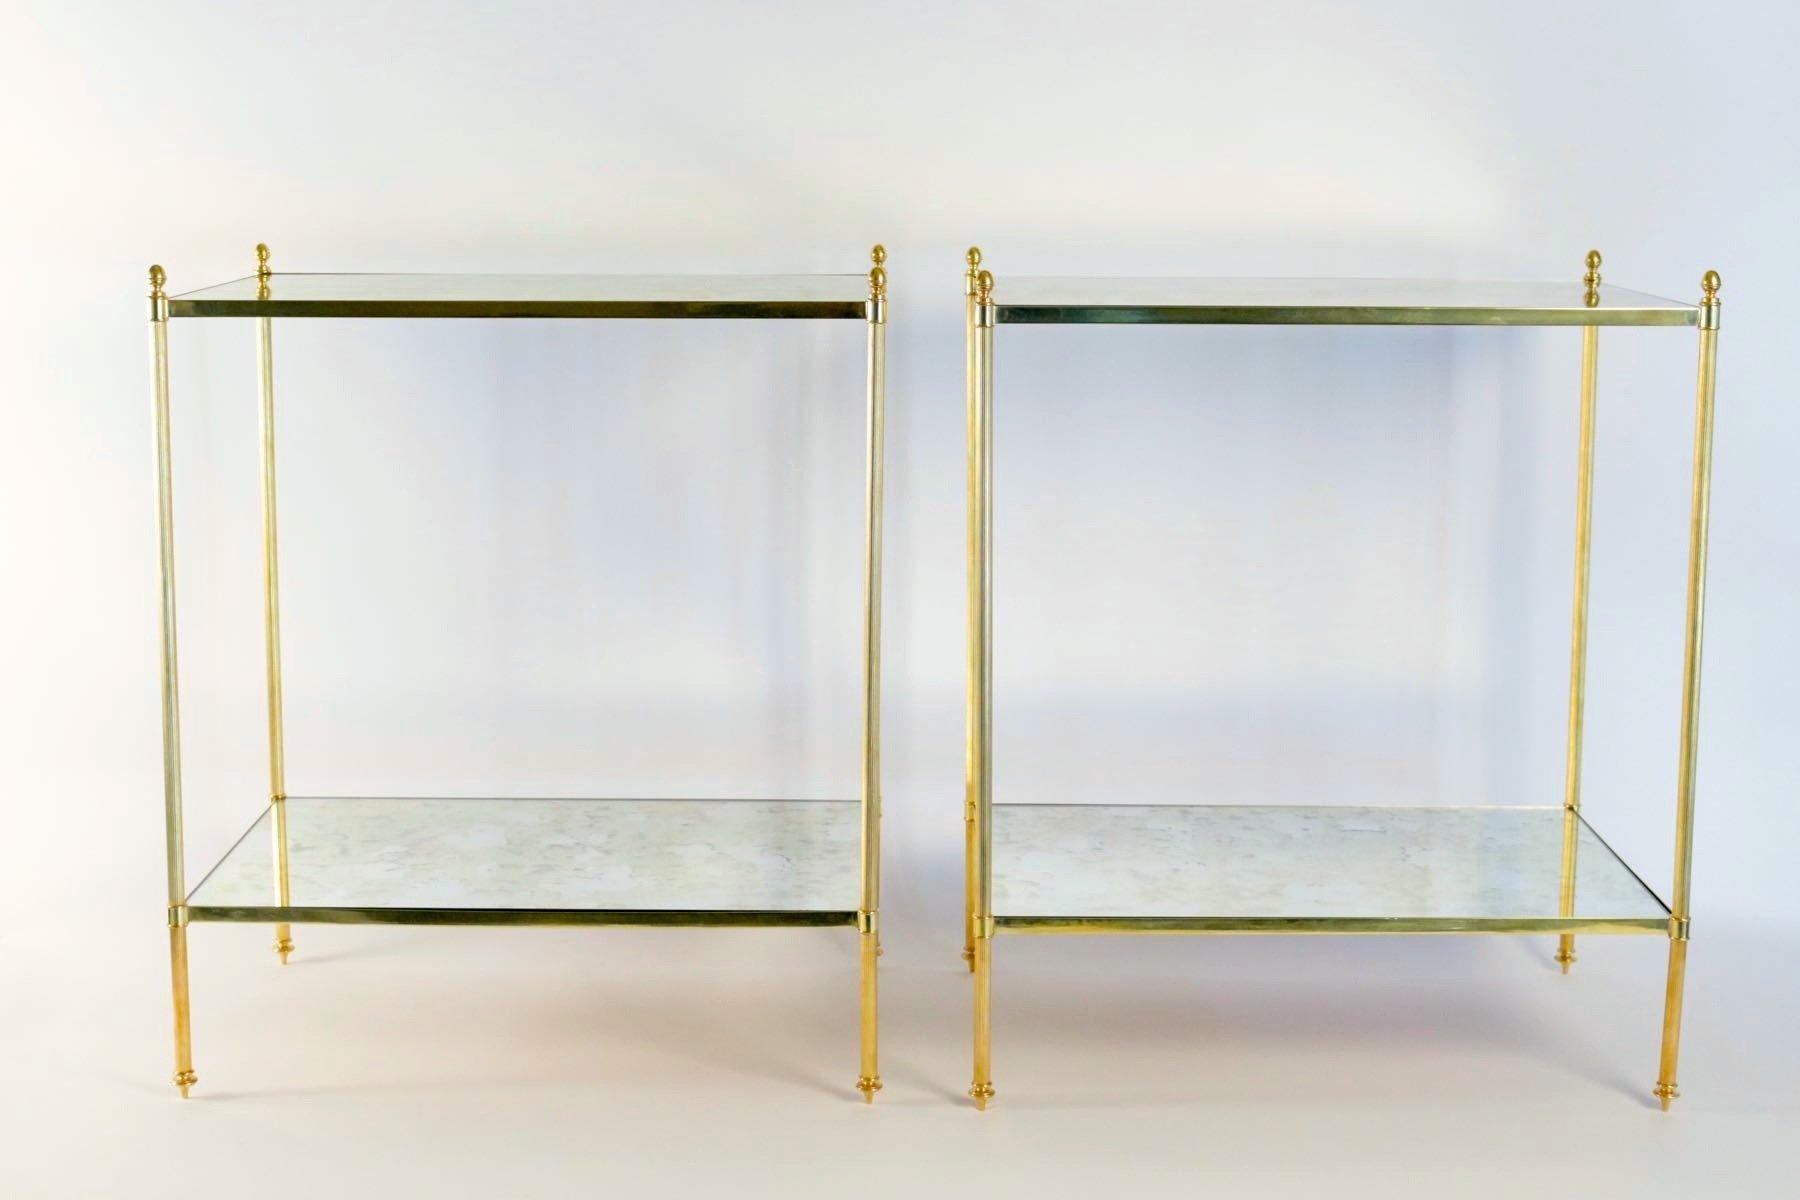 tables d appoint vintage en laiton dor 1970s set de 2. Black Bedroom Furniture Sets. Home Design Ideas